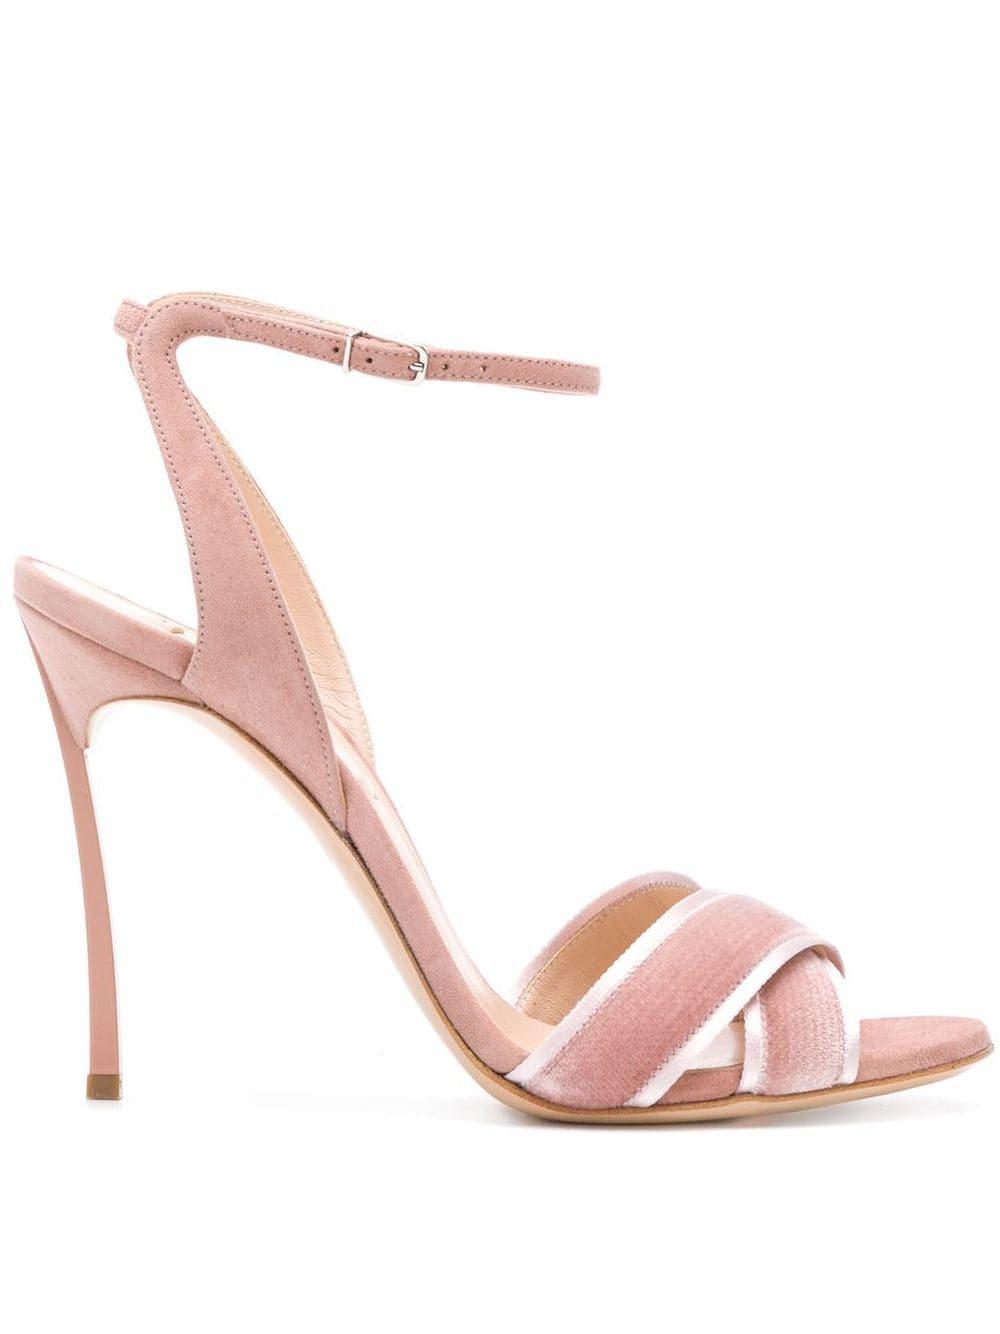 Casadei Crossover Strap Sandals - Farfetch